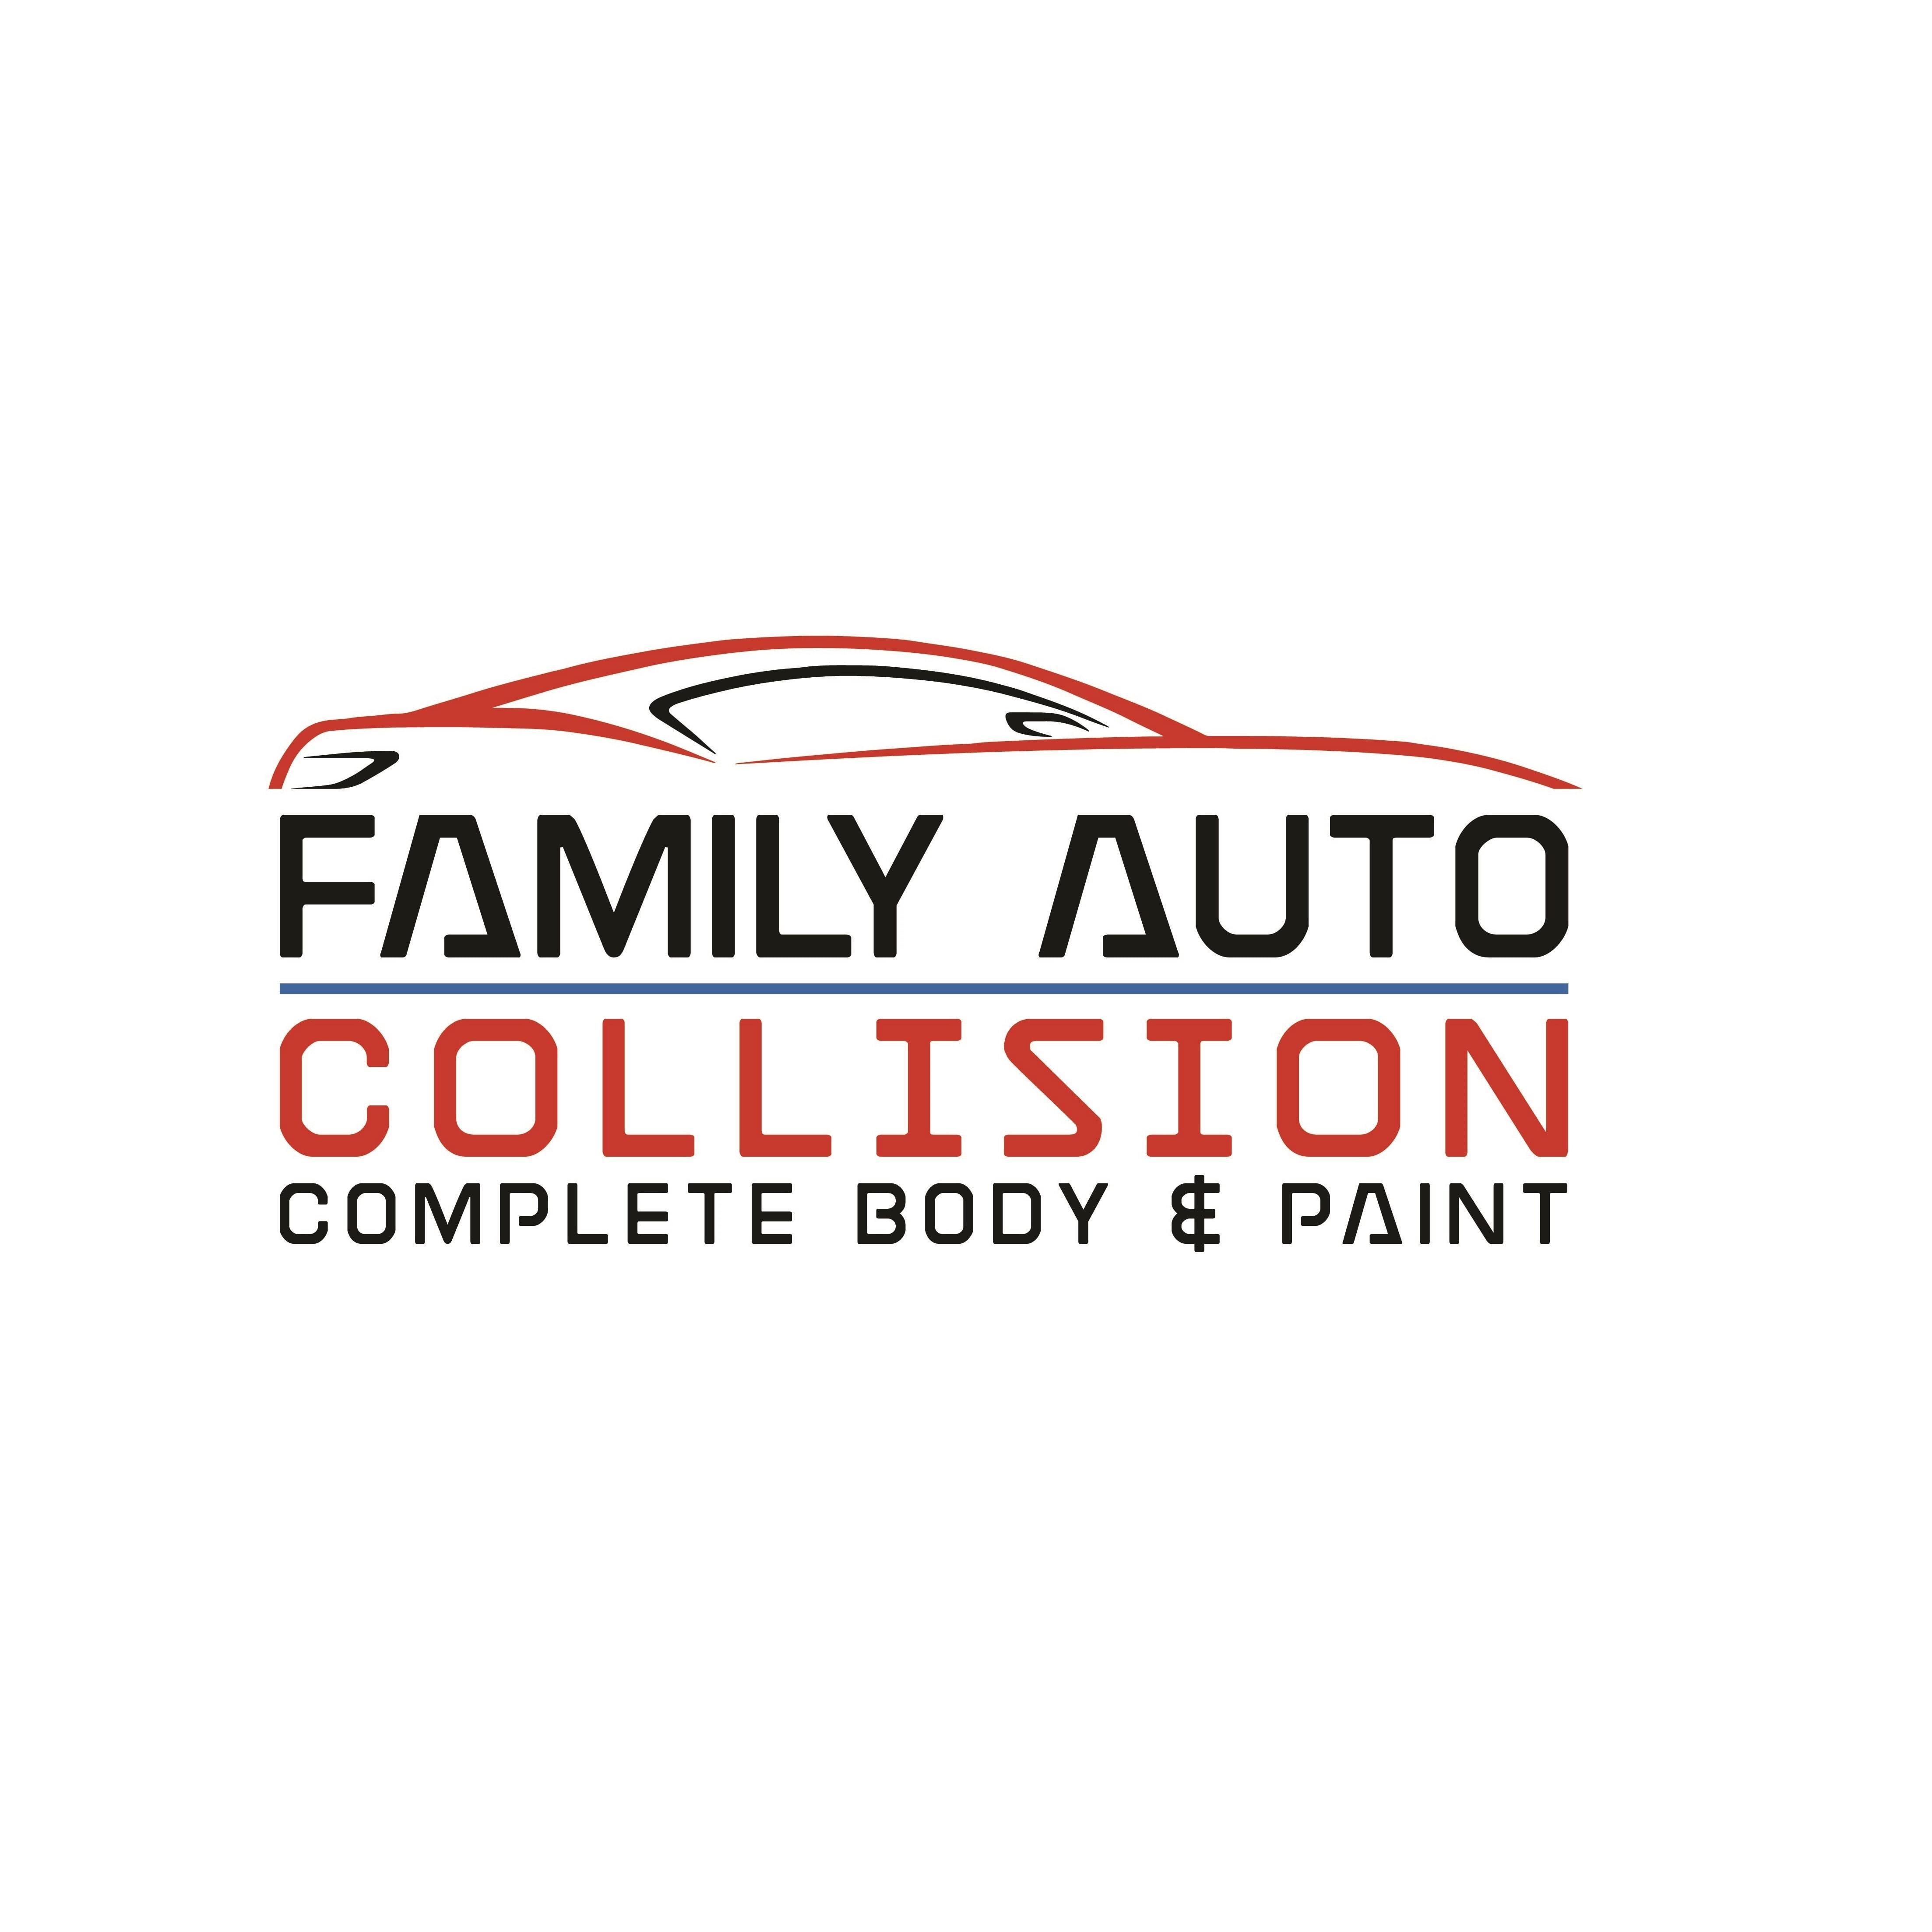 Family Auto Collision